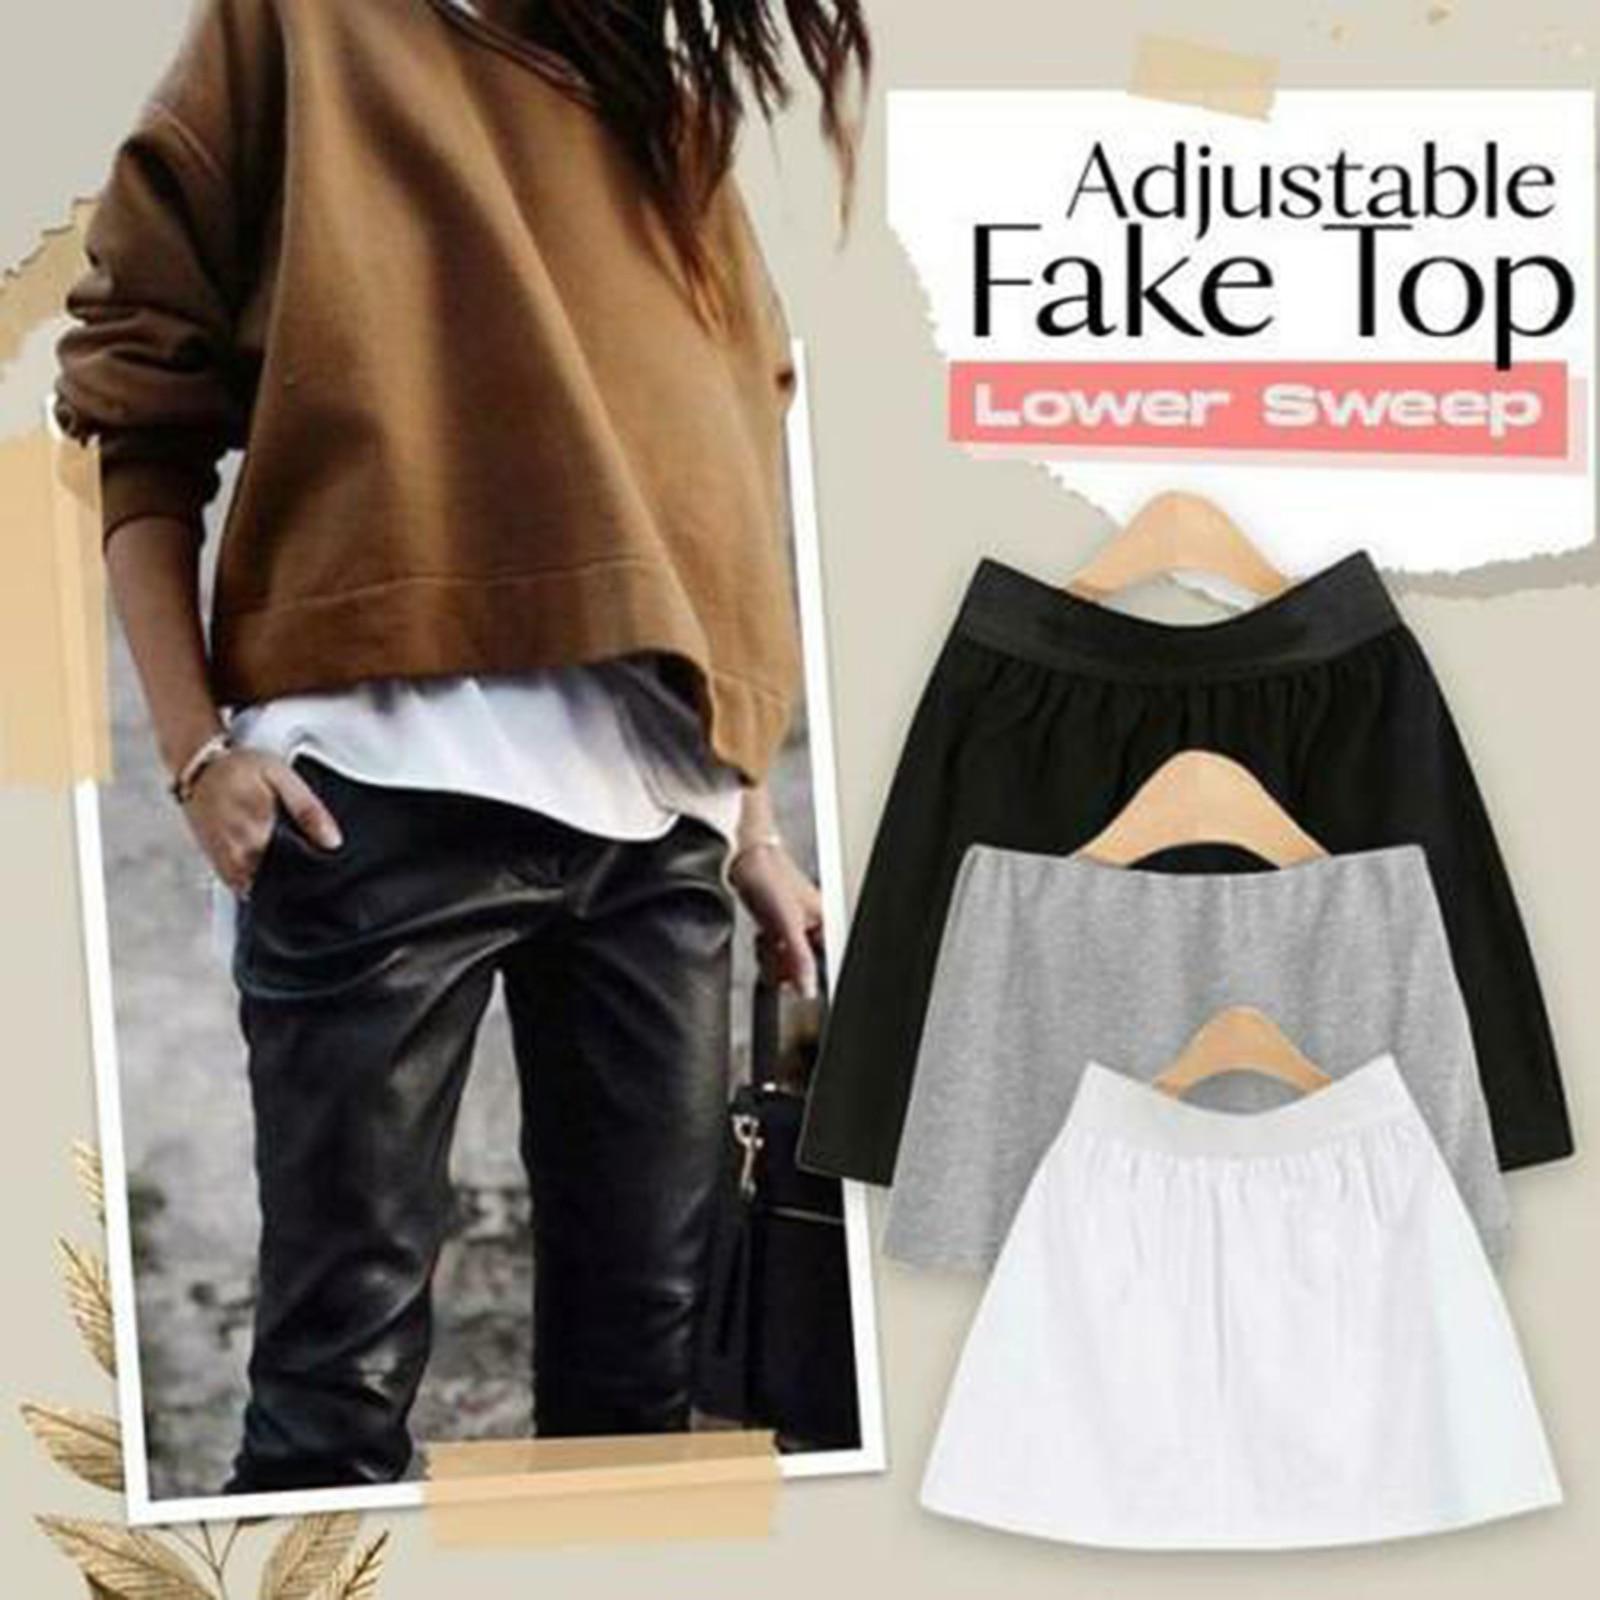 High Waist Skirt Adjustable Layering Fake Top Lower Sweep Set Skirt Half-length Splitting A Version Women Casual Skirts 1